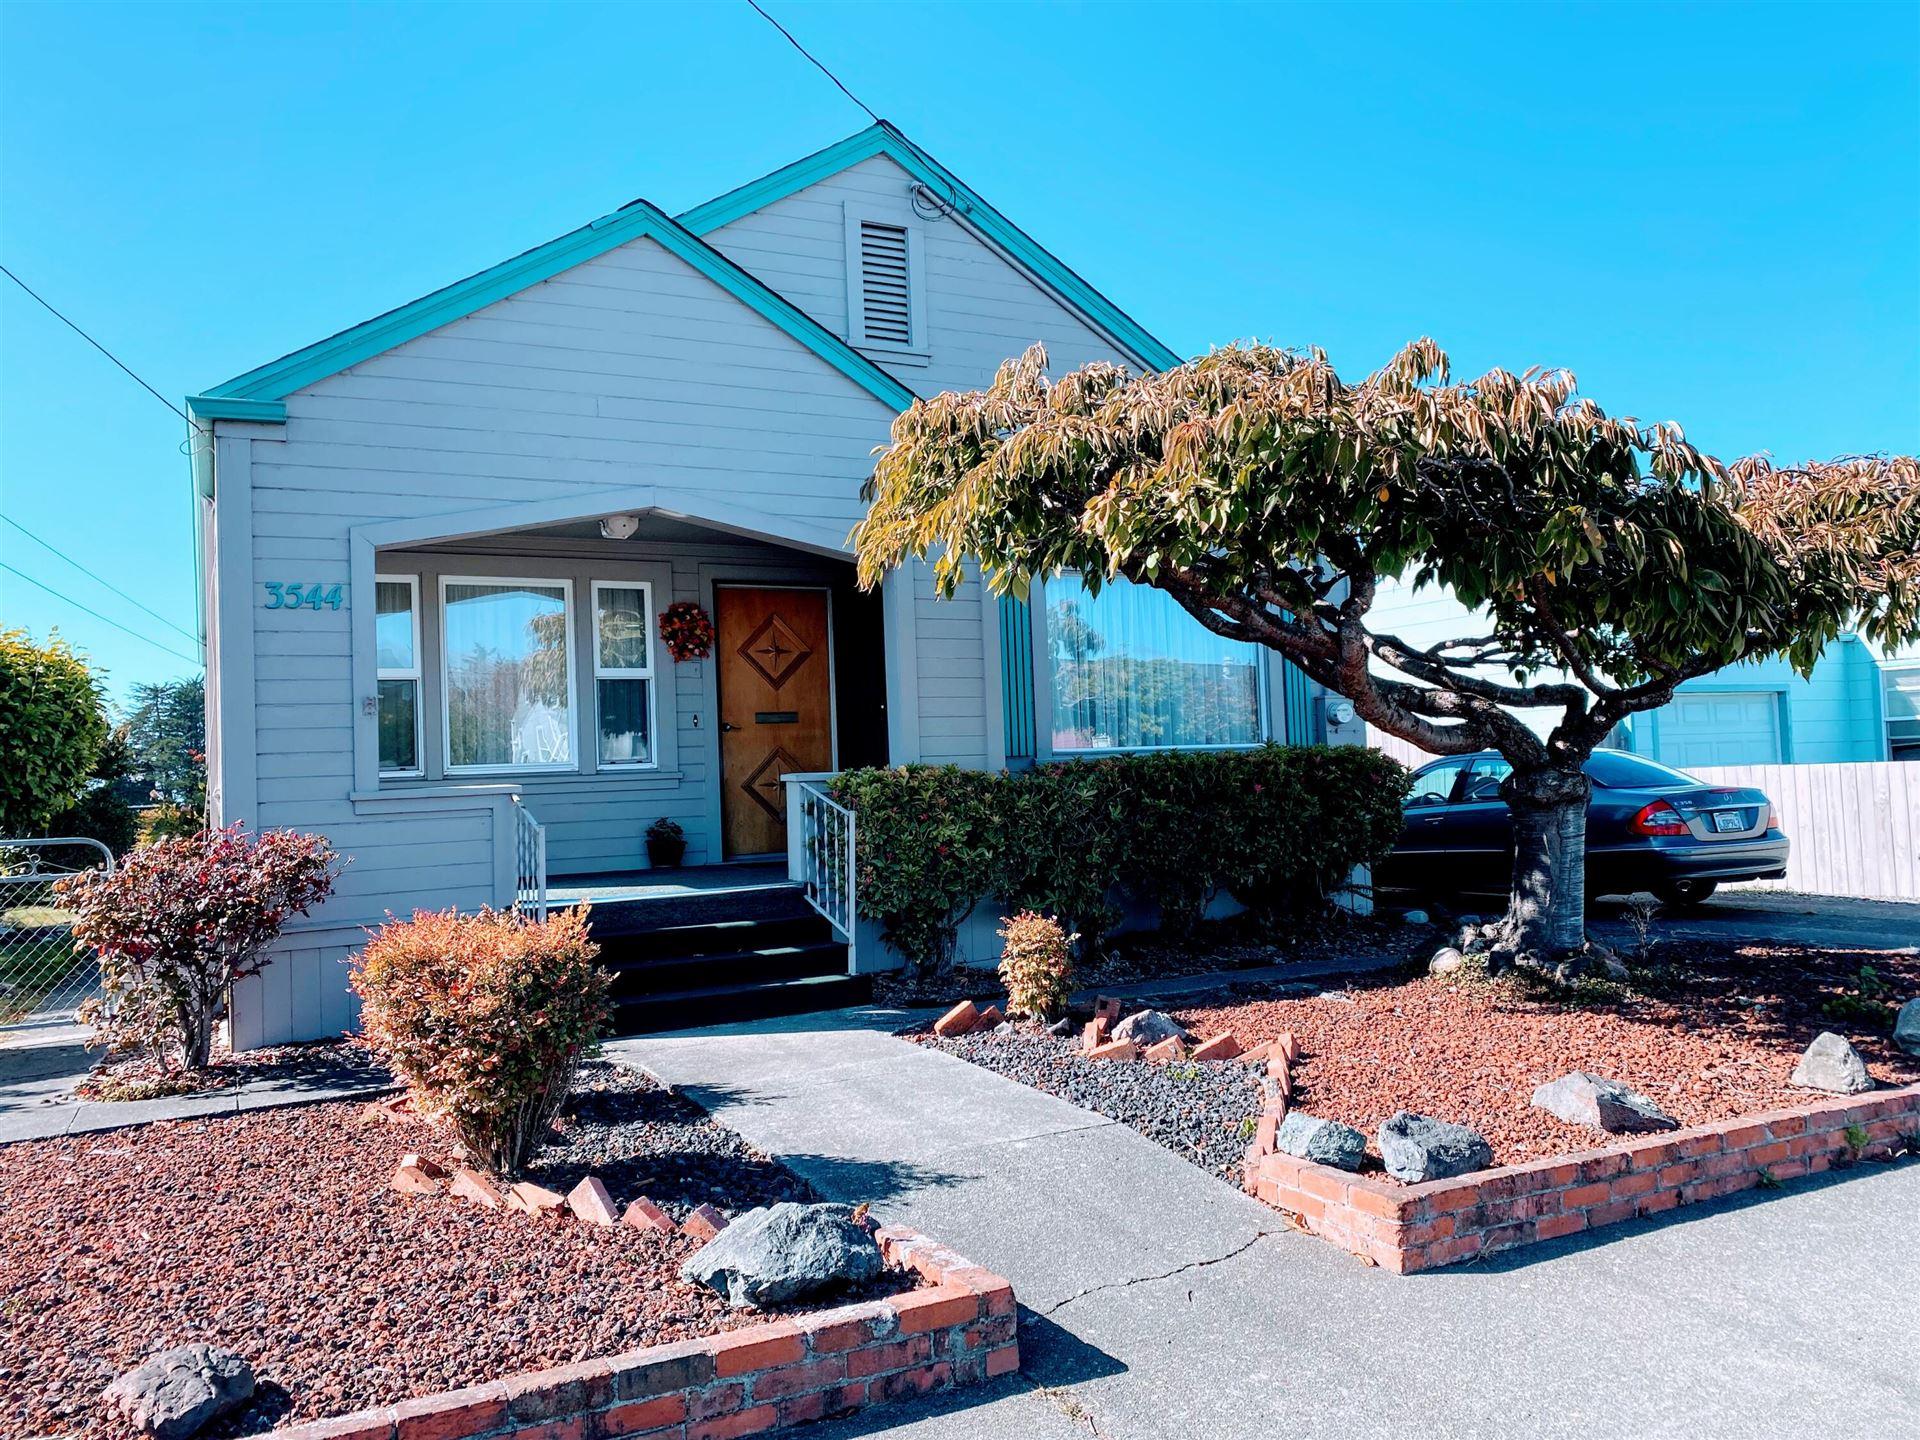 3544 Spring Street, Eureka, CA 95503 - MLS#: 260347